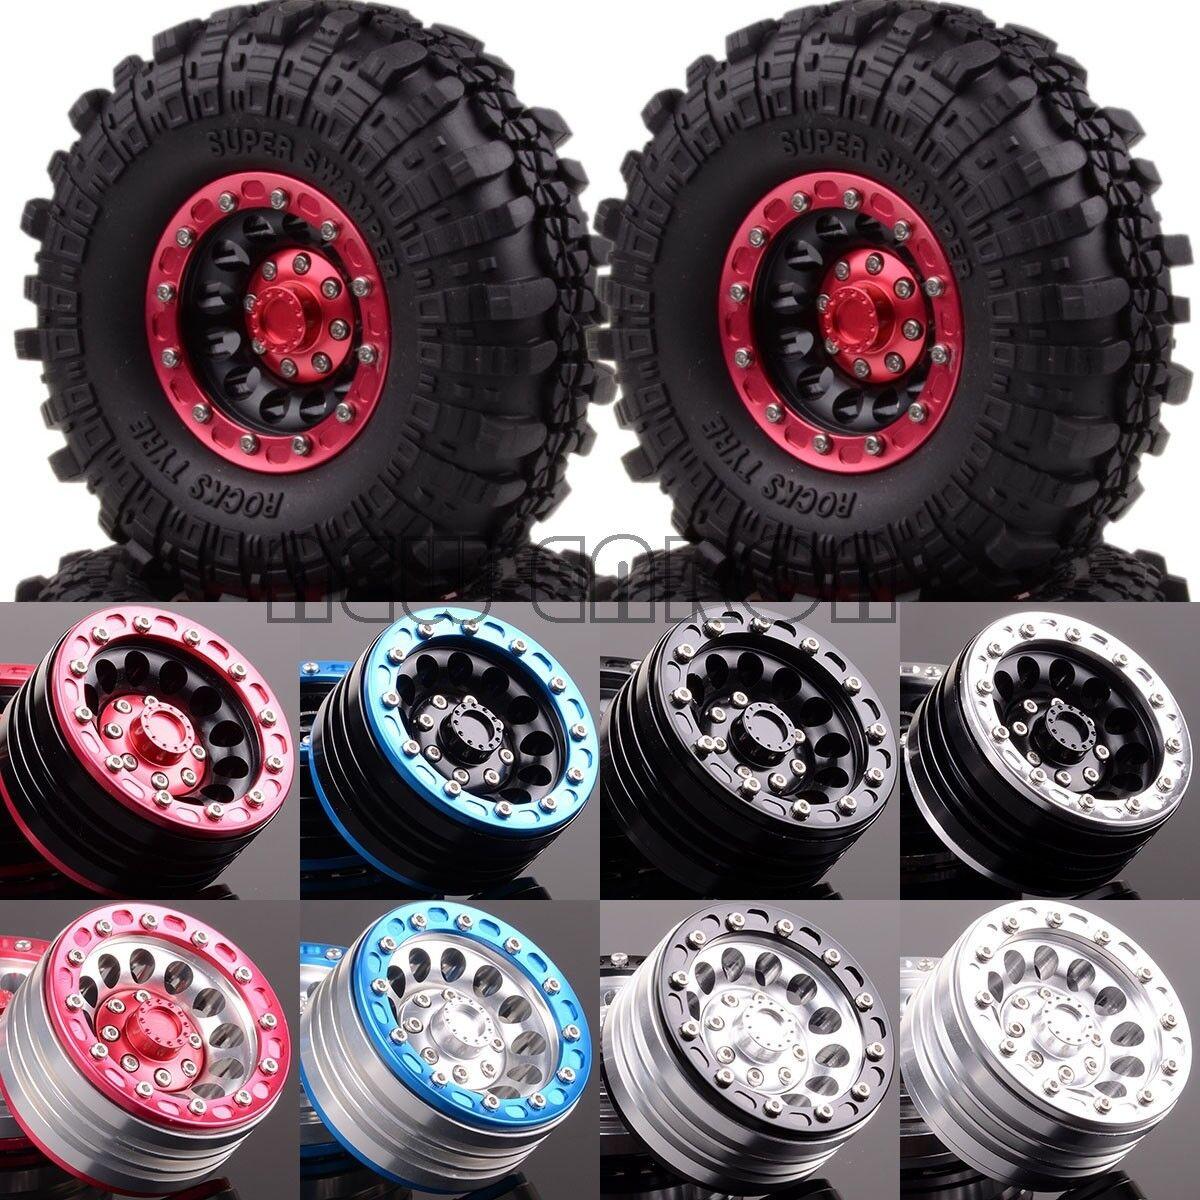 4P Metal 1.9  Wheel Complete Super Swamper Rocks 1060-7035 RC 1 10 Rock Crawler